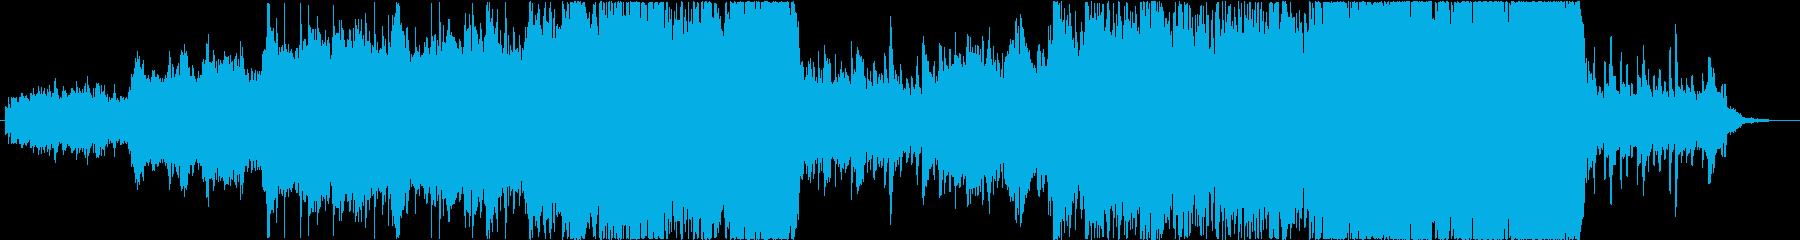 Emotional Musicの再生済みの波形